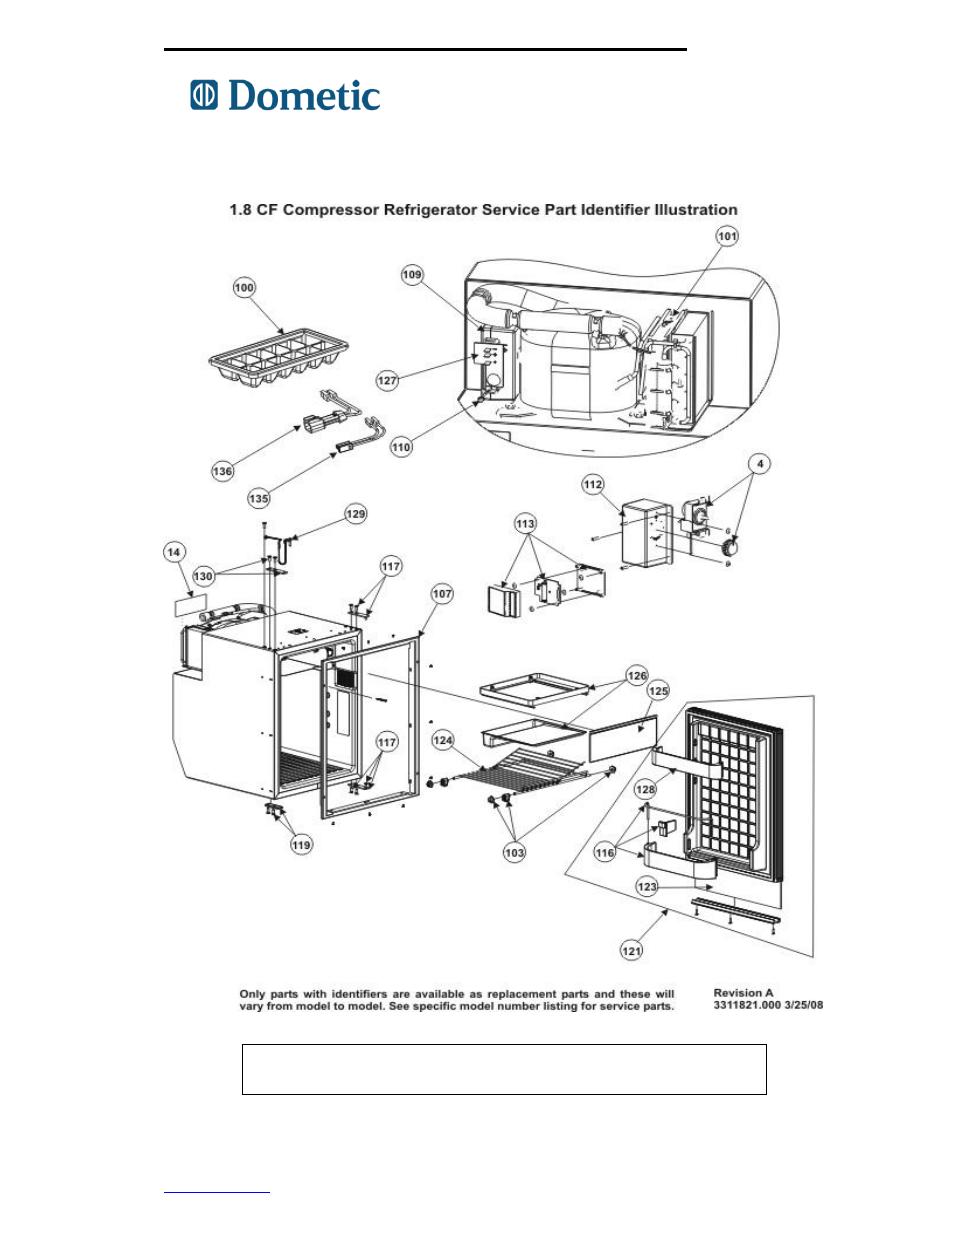 Manualguide Dometic Refrigerator Parts Manual Schematic Freightliner Troubleshooting Guide 750000005 Rh Manualsdir Com